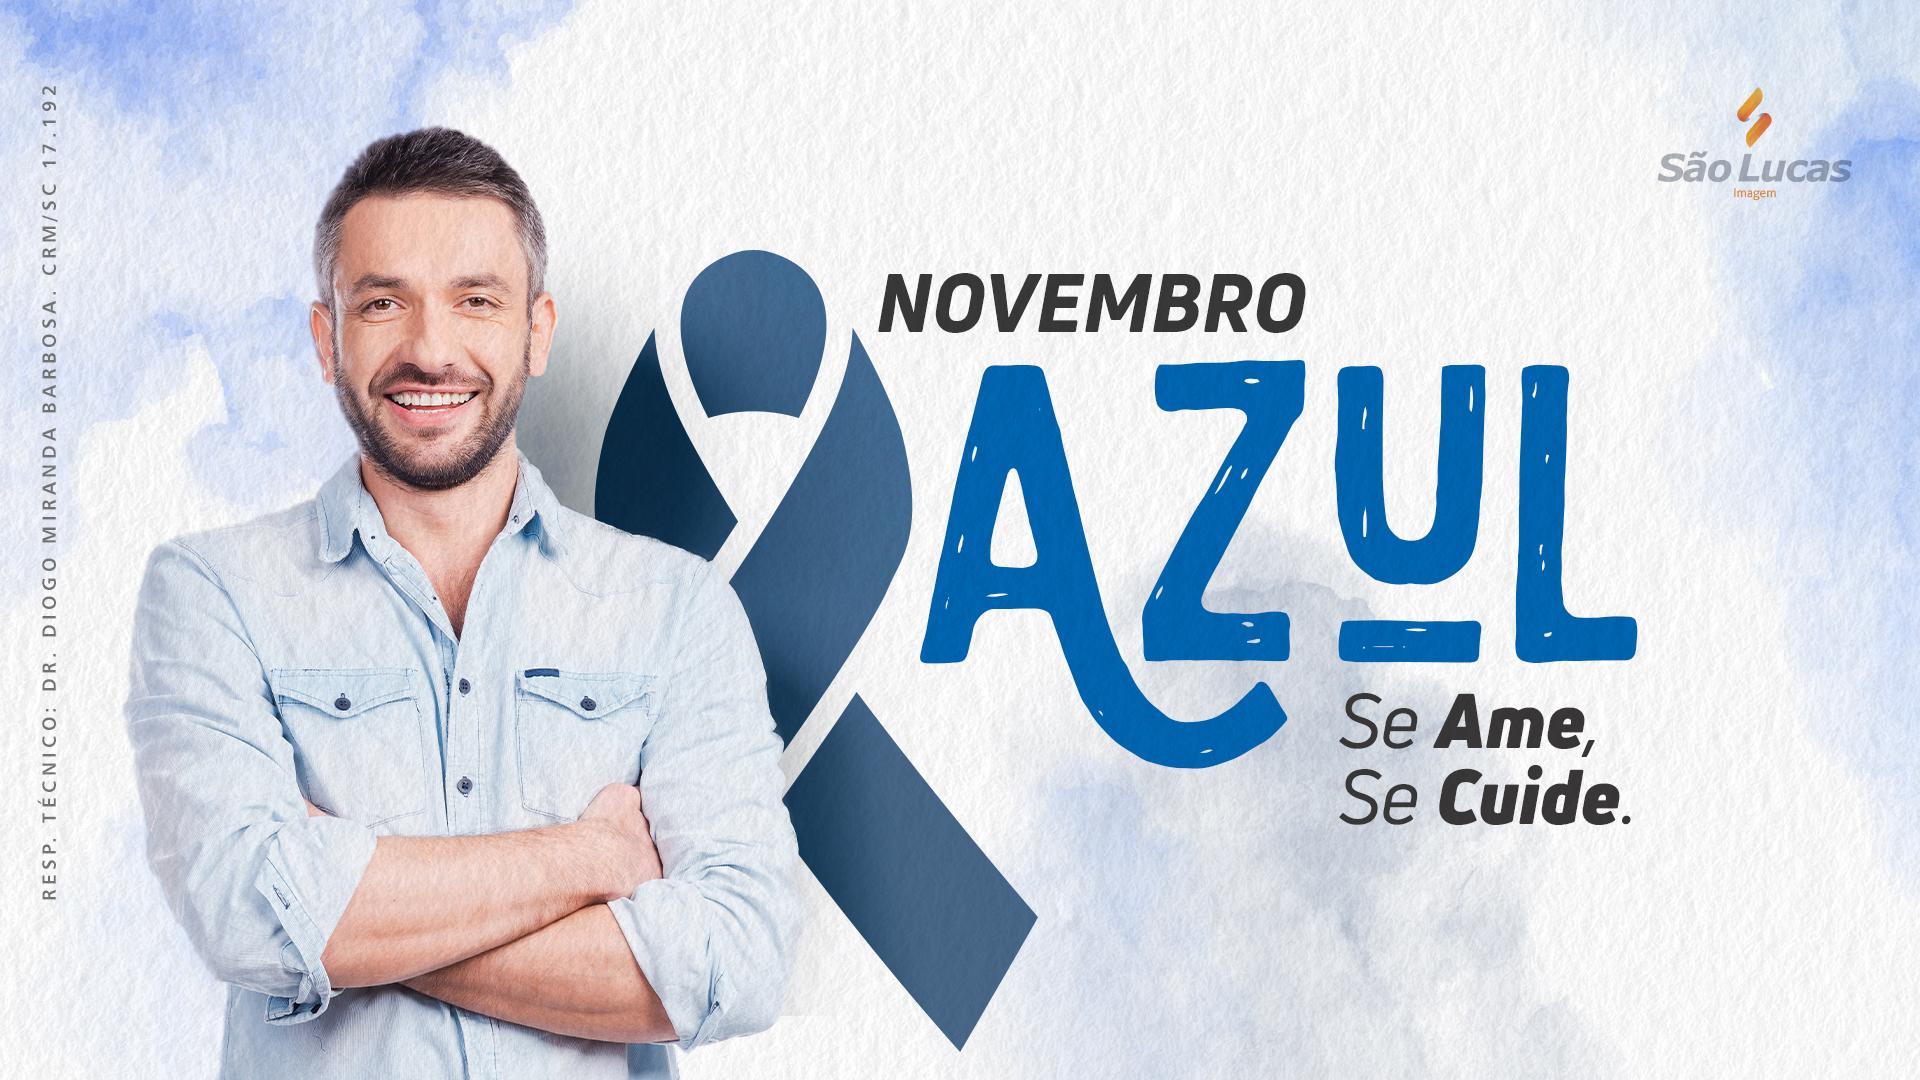 Novembro Azul – Se Ame, Se cuide!